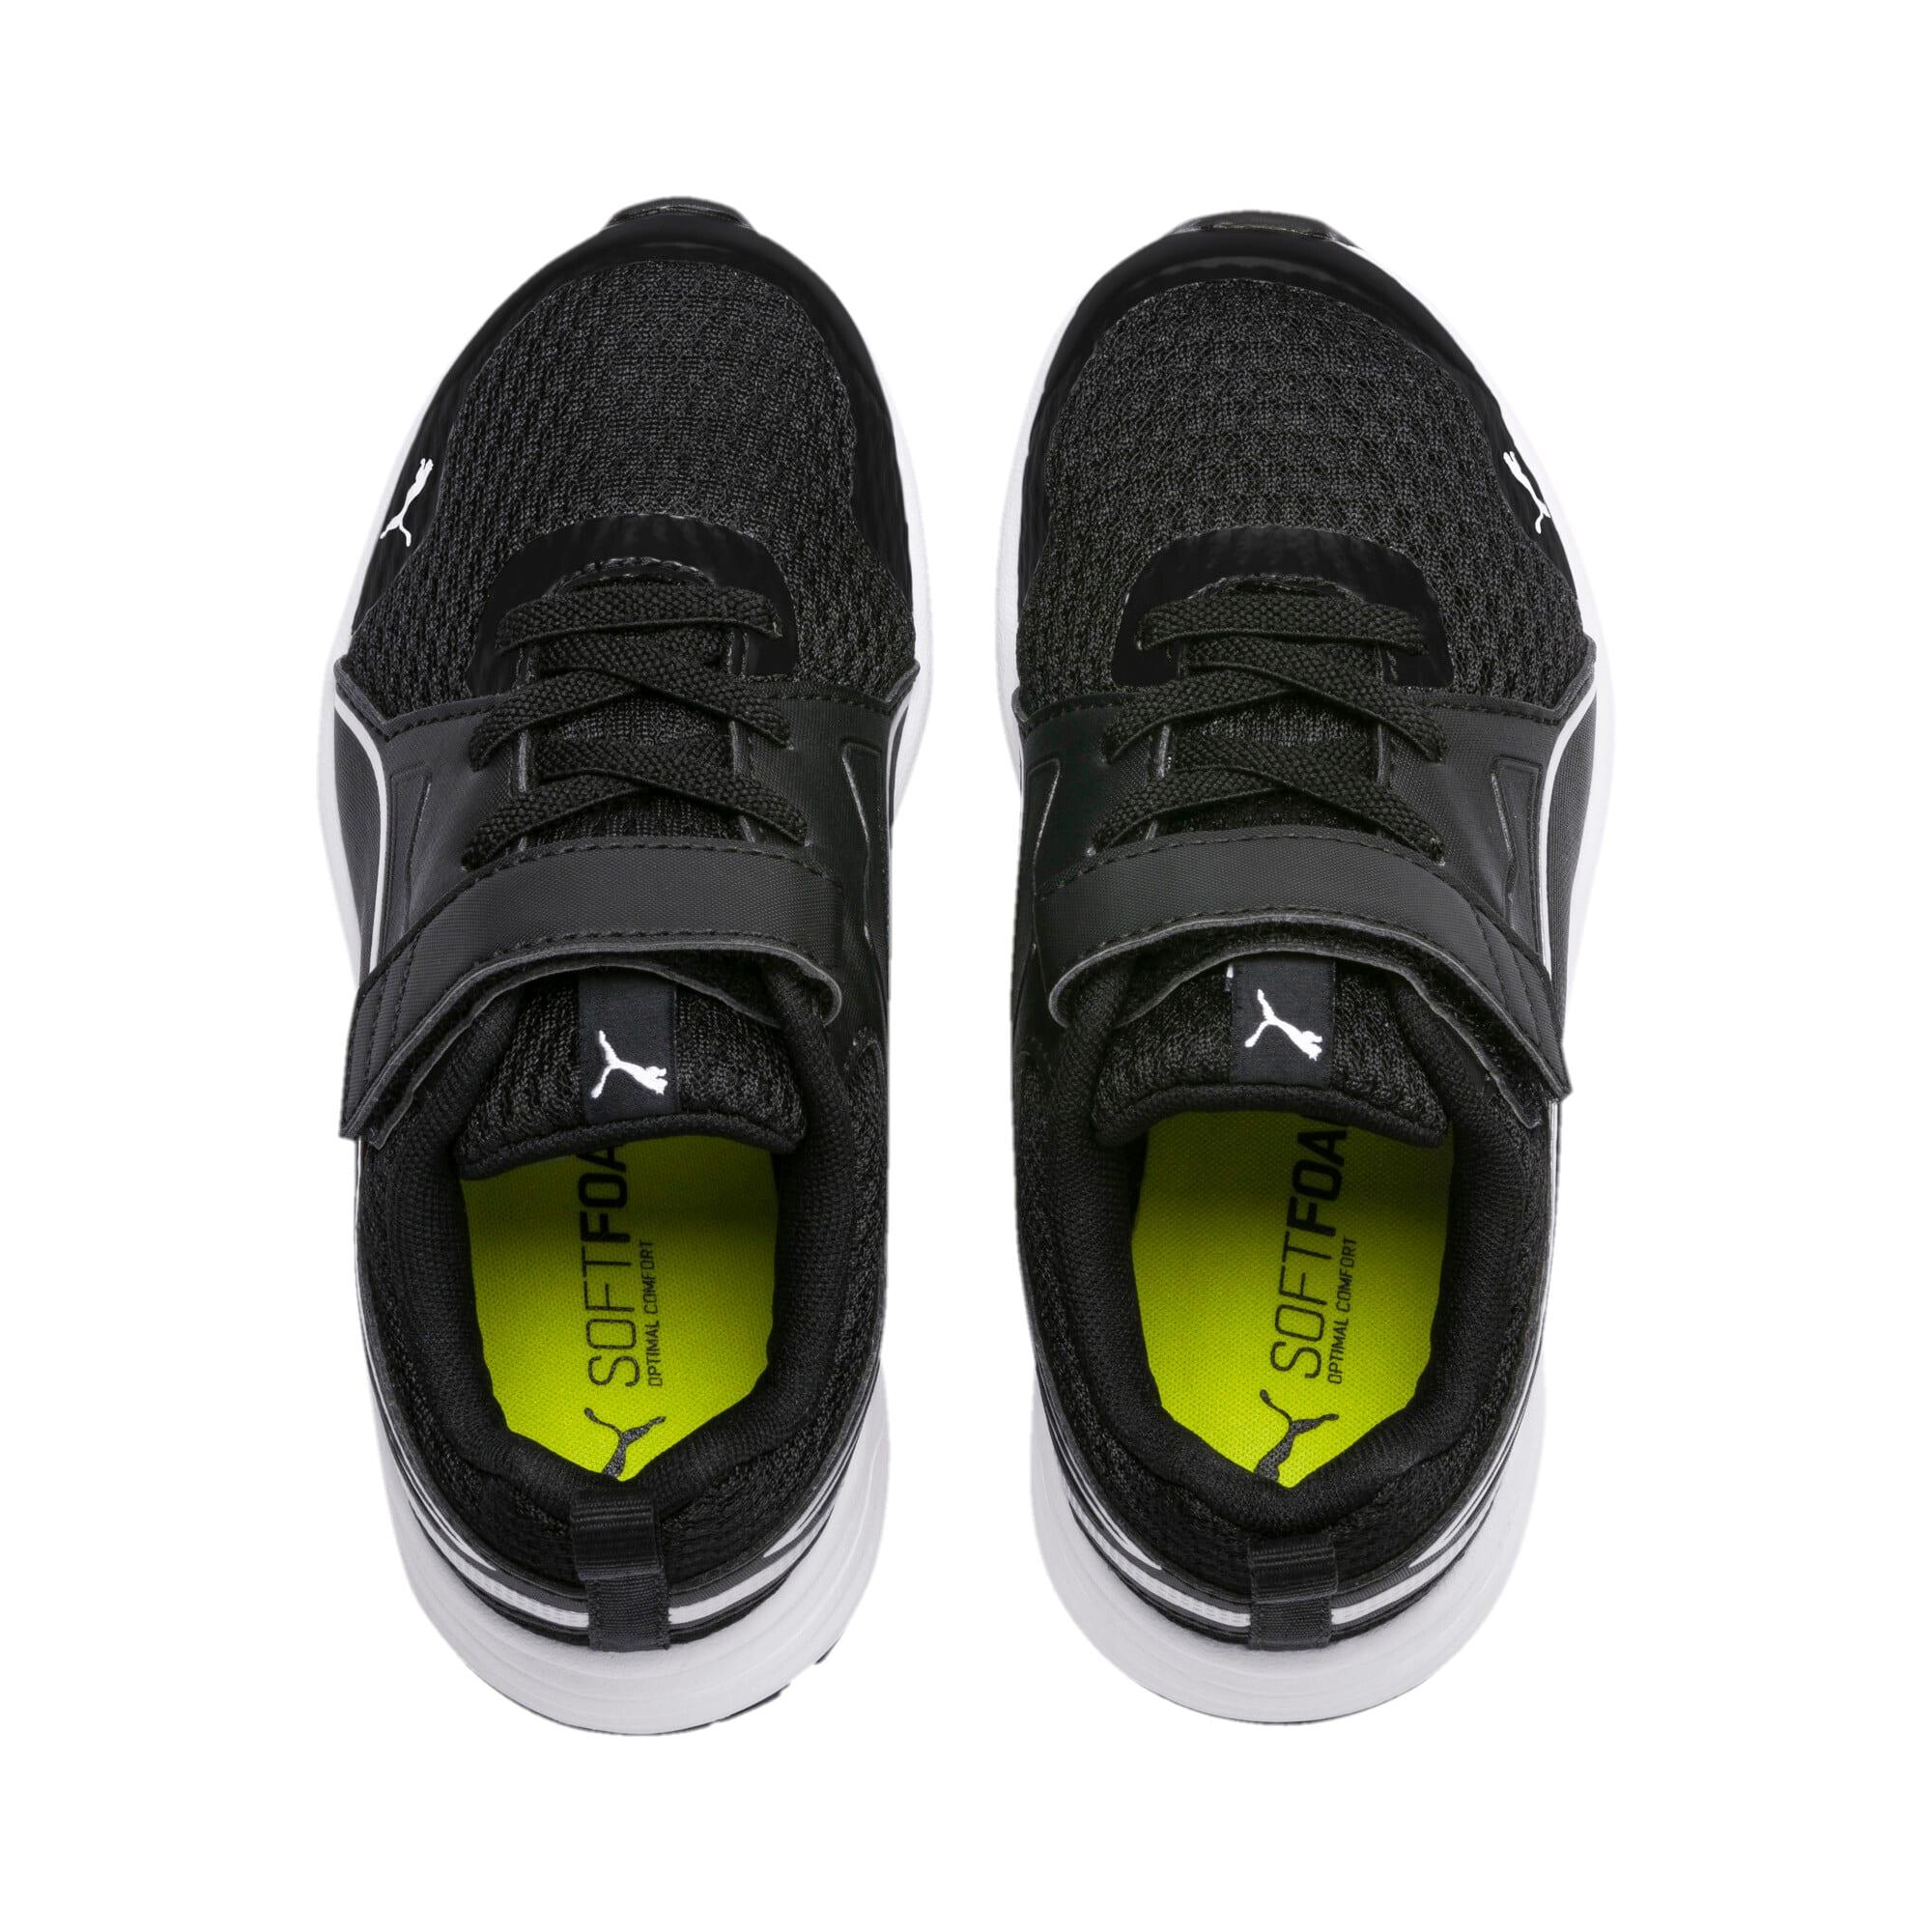 Thumbnail 6 of Pure Jogger V Kids' Trainers, Black-Silver-Wht-Nrgy Yellow, medium